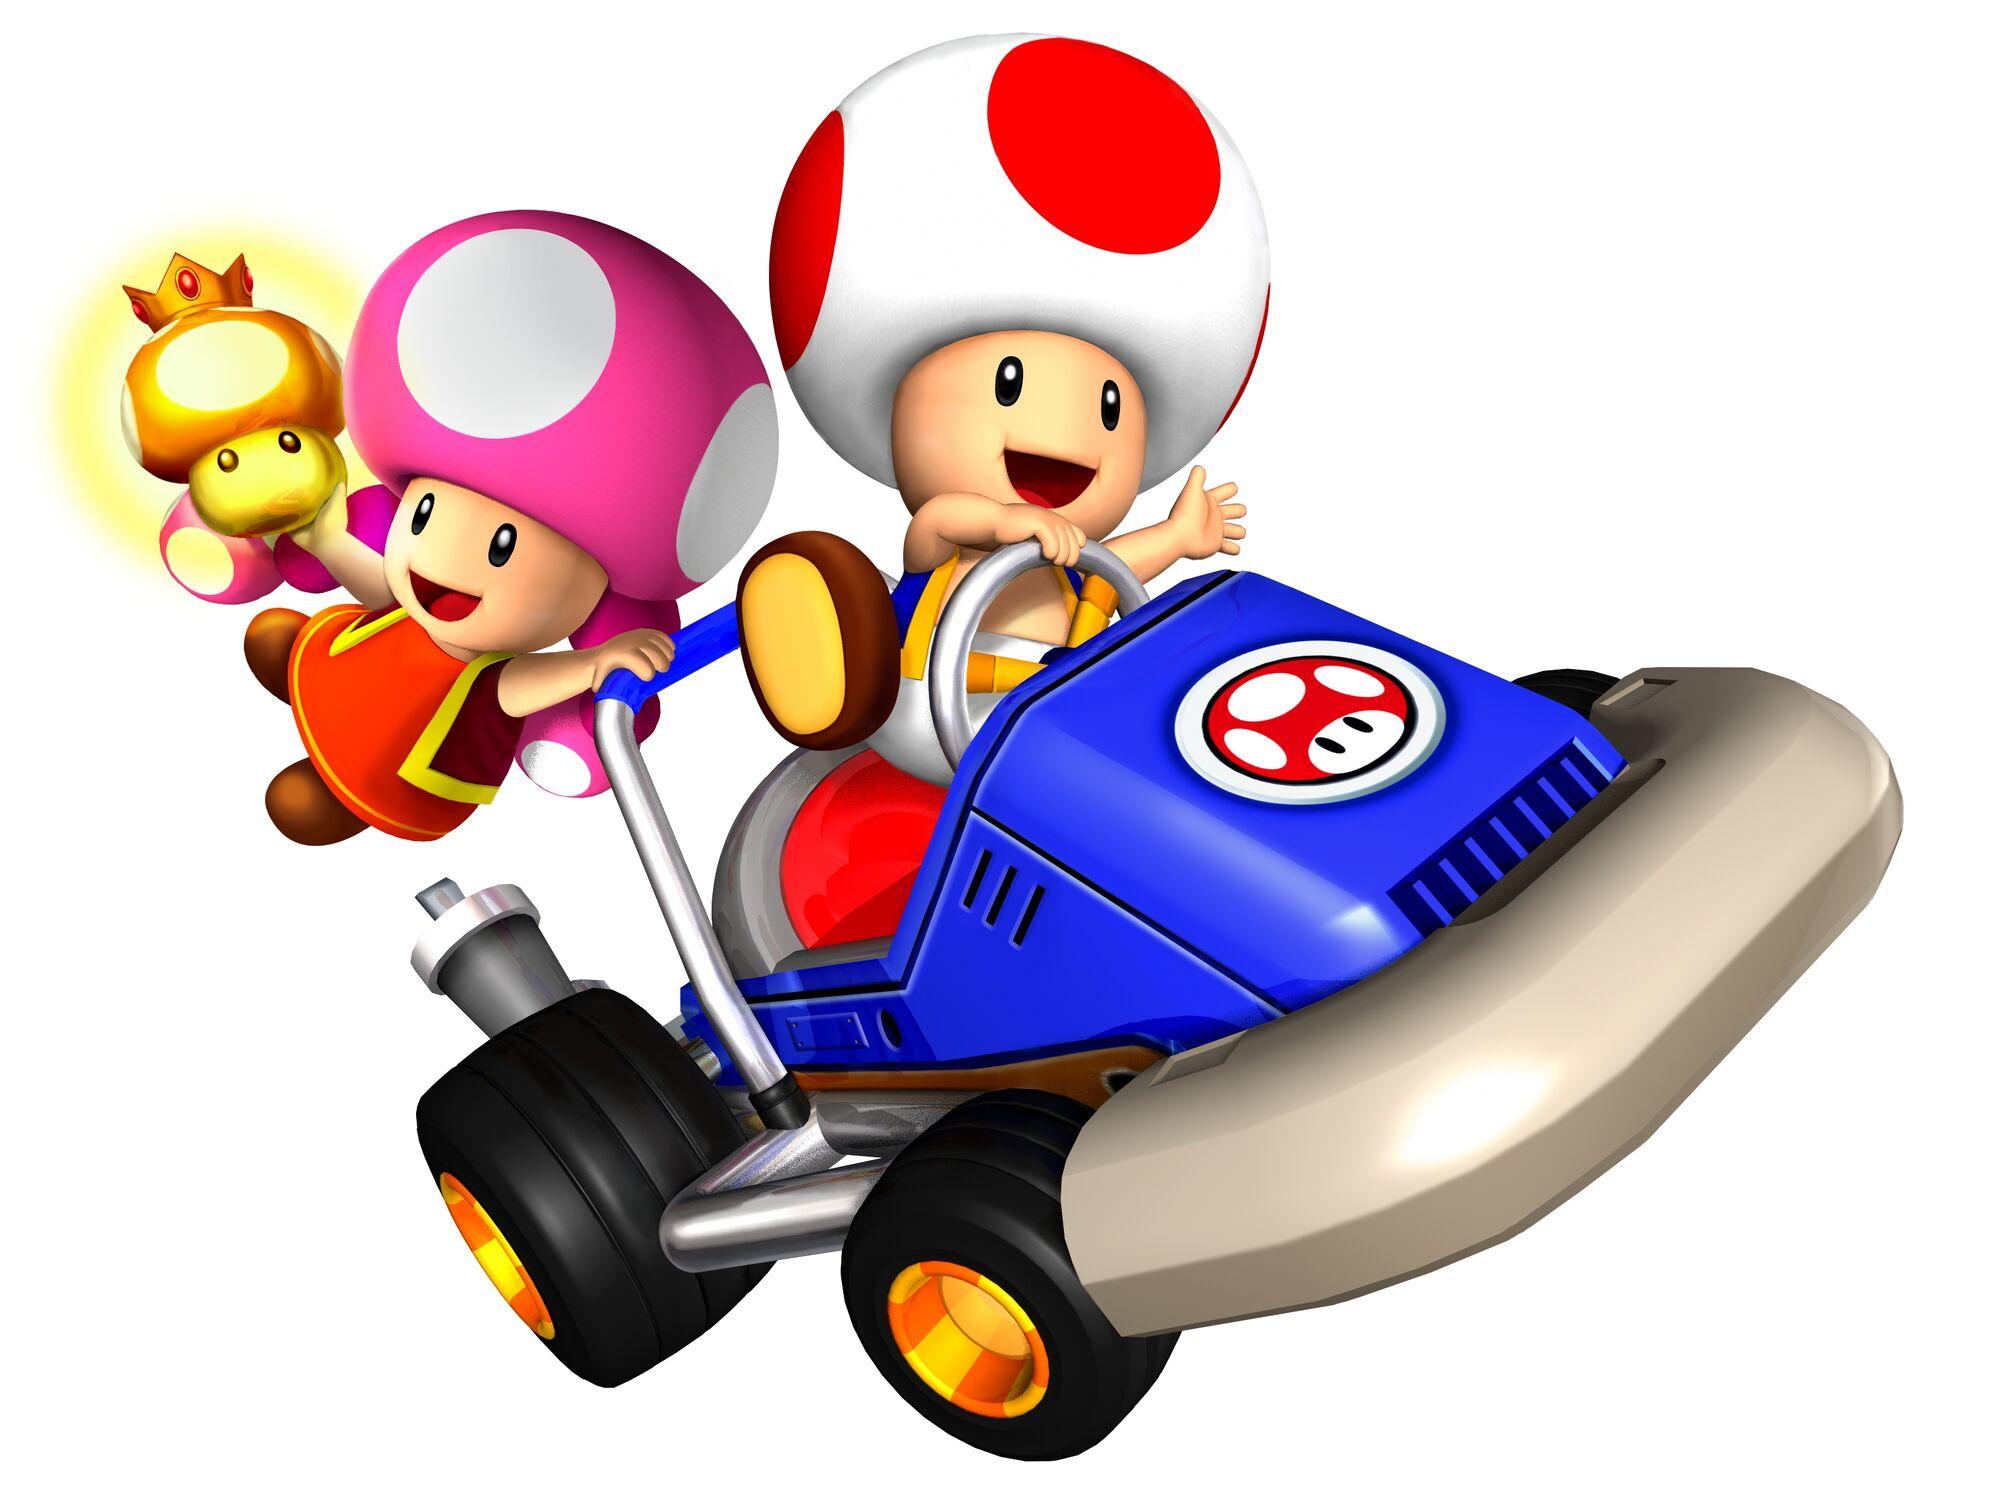 Mario Kart Double Dash Koopa And Paratroopa